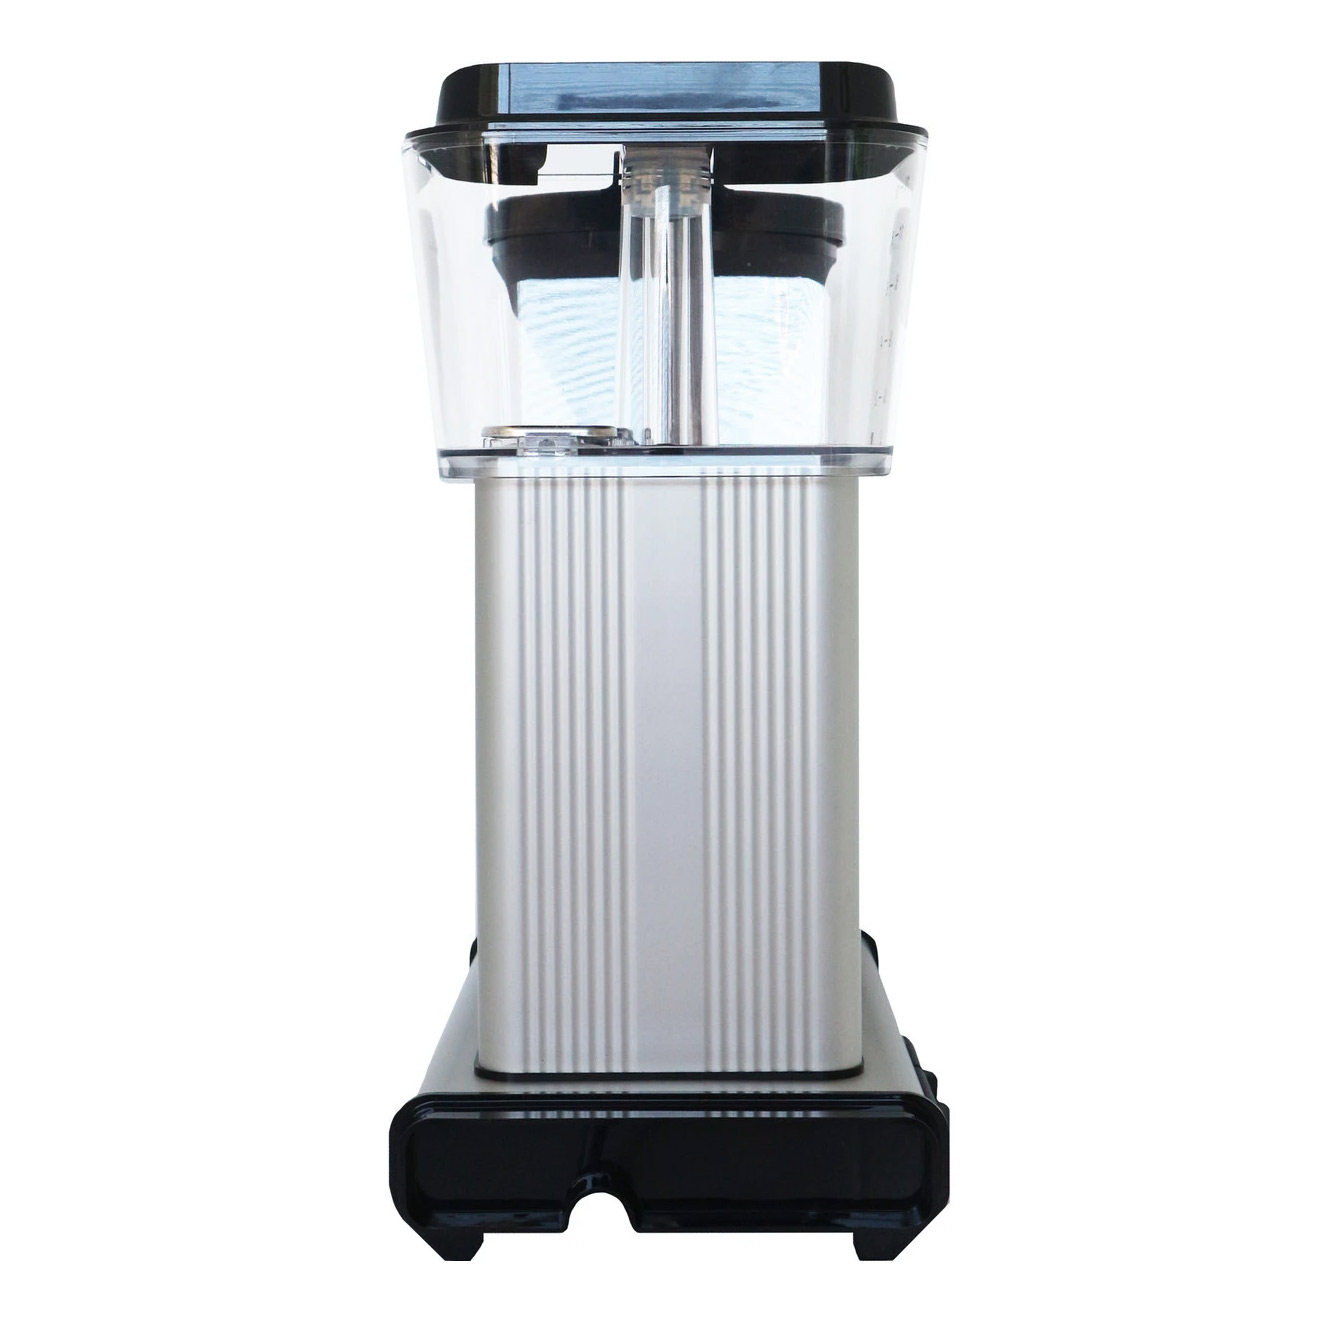 Technivorm Moccamaster KBGV Select Brewer Glass Carafe Polished Silver - 53941